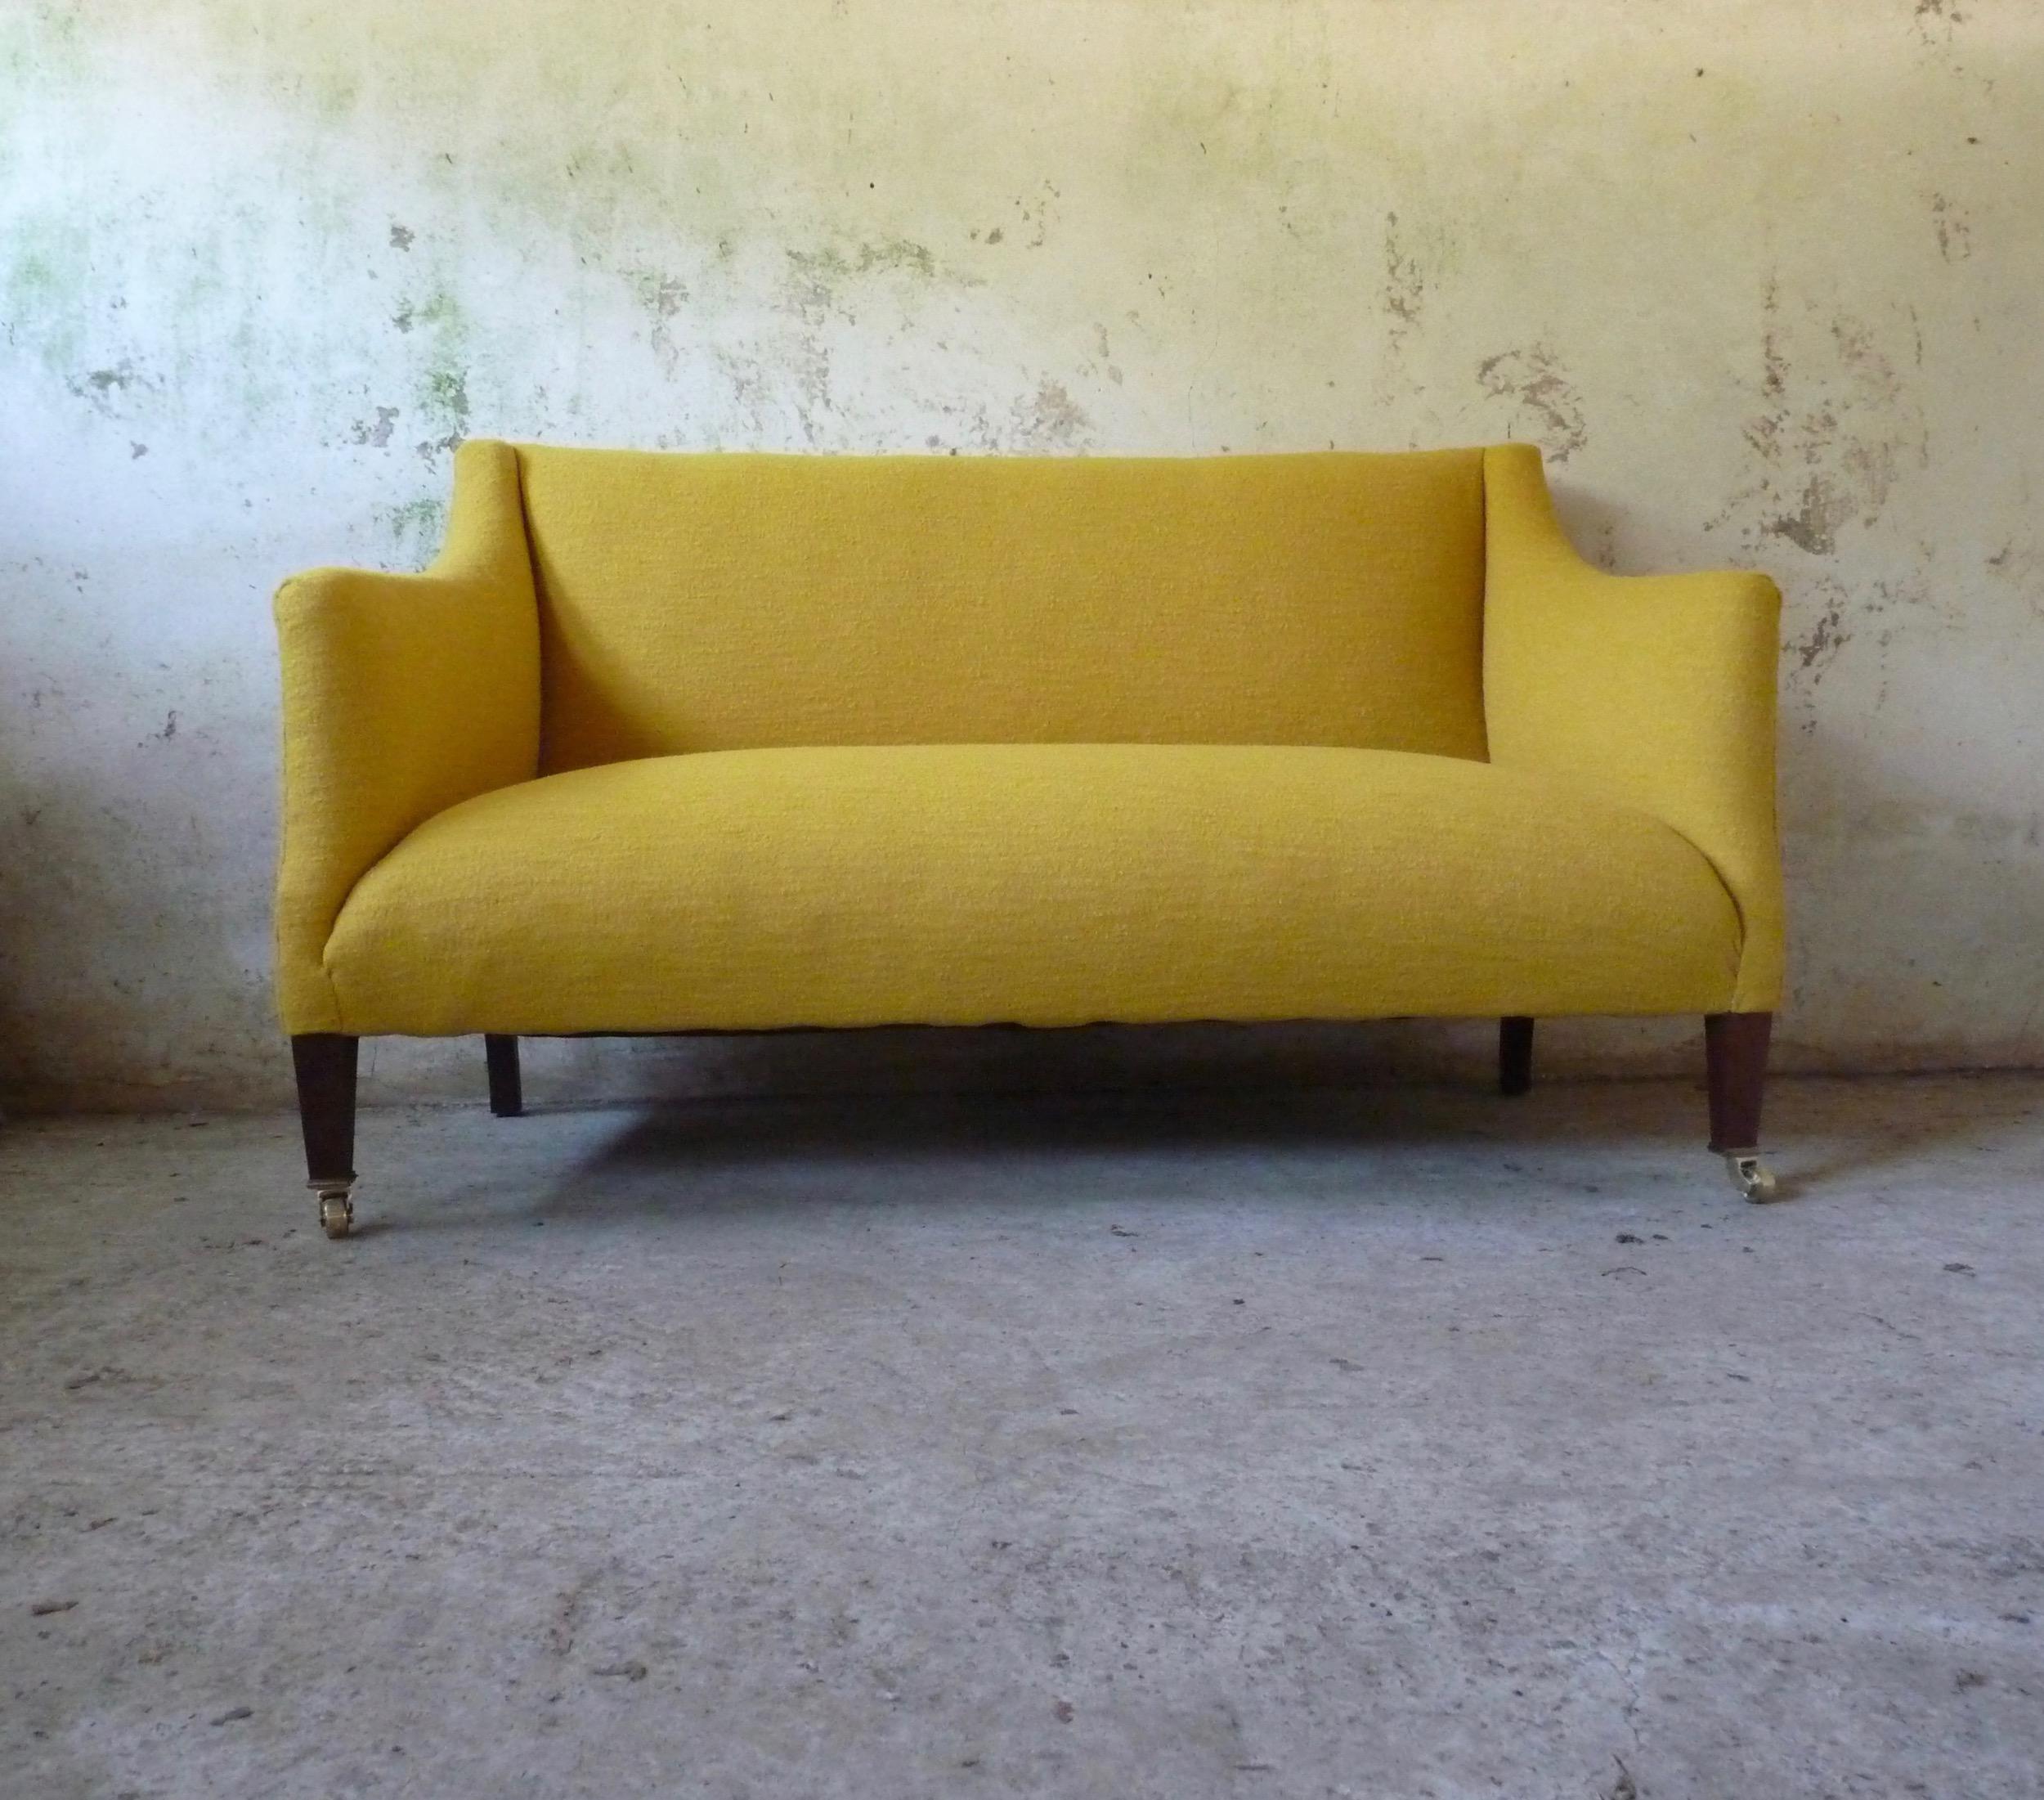 Edwardian settee upholstered in wool